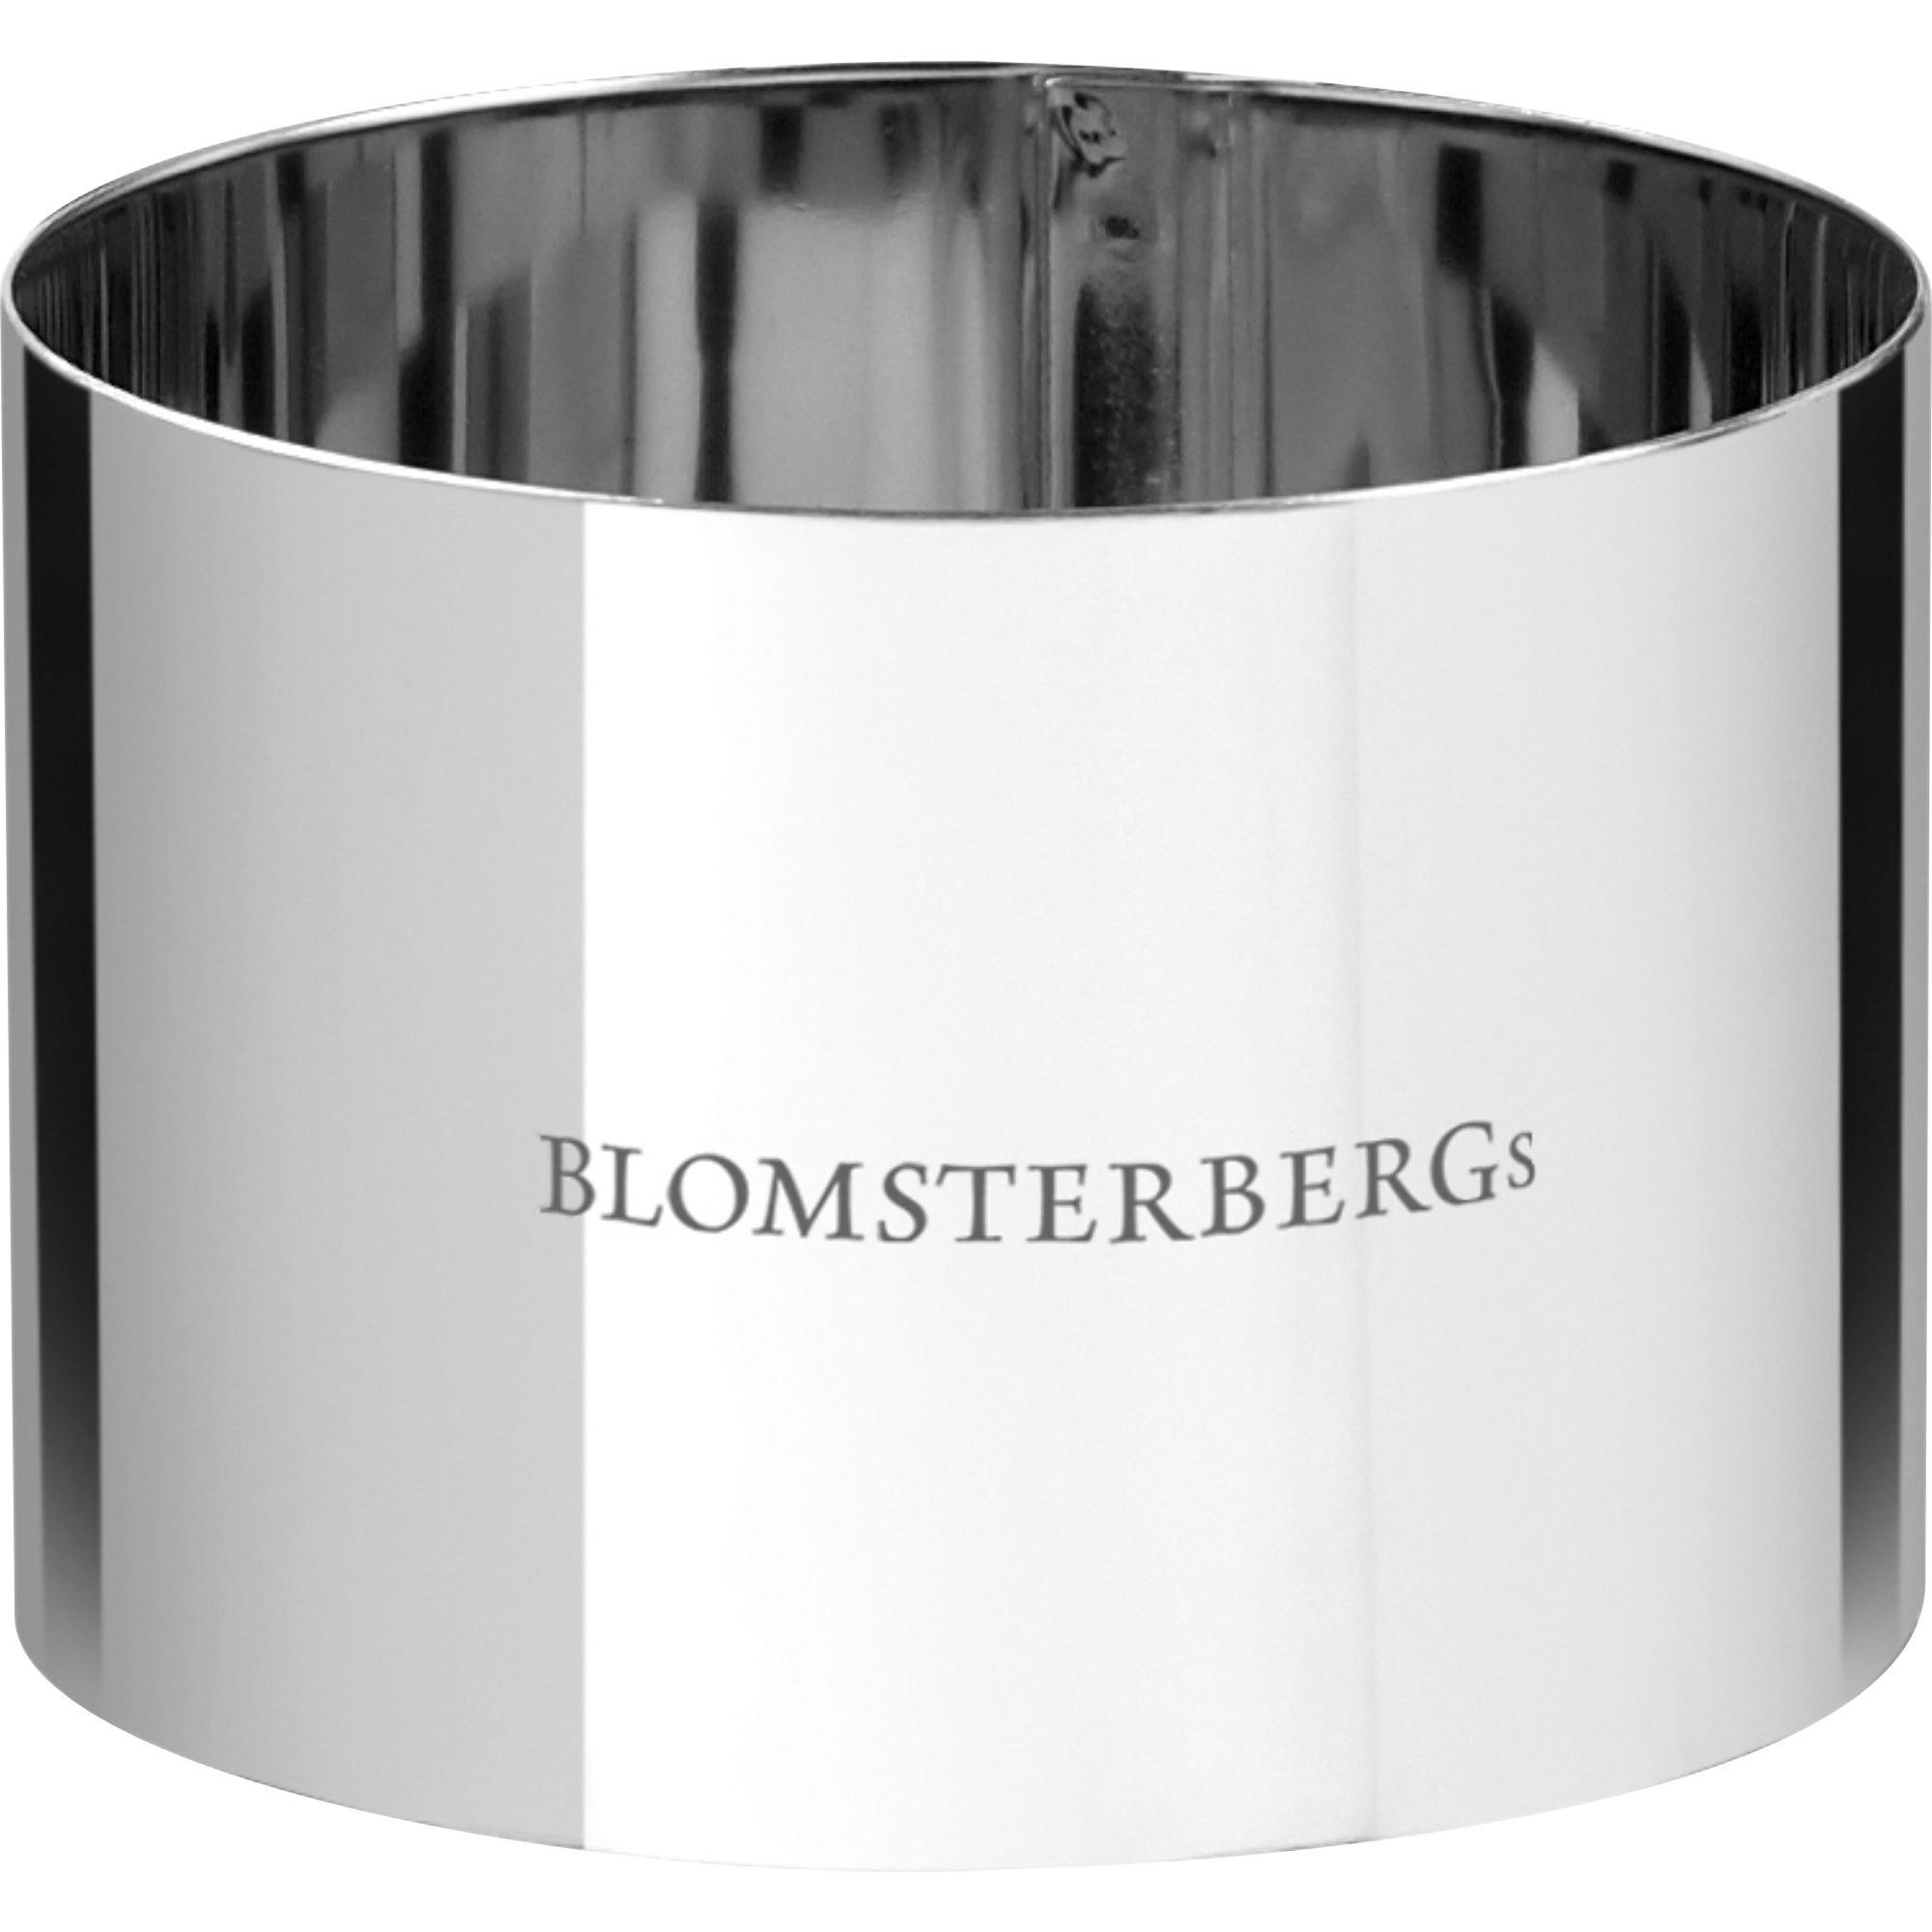 Blomsterbergs Tårtring 7 cm 2 st